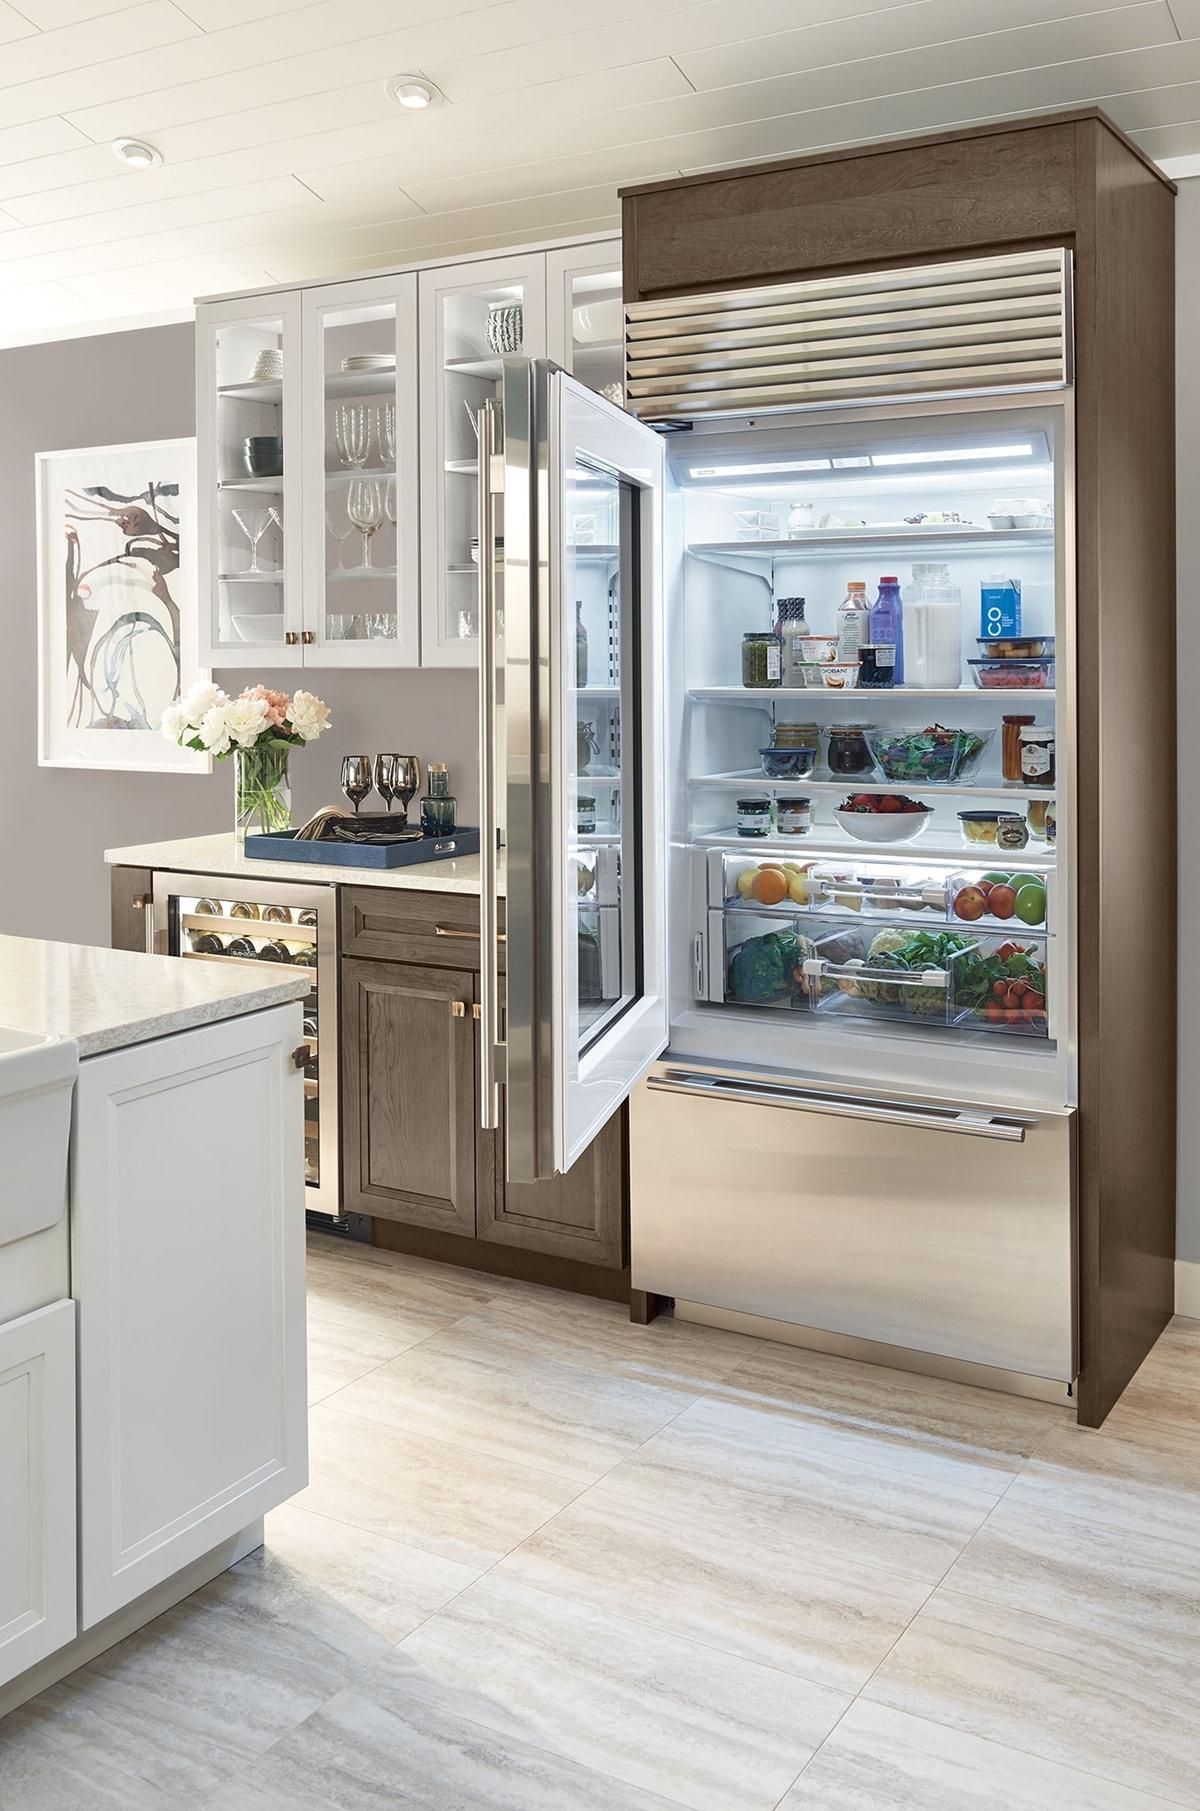 Sub zero 36 classic over and under refrigerator freezer - Glass door refrigerator freezer ...